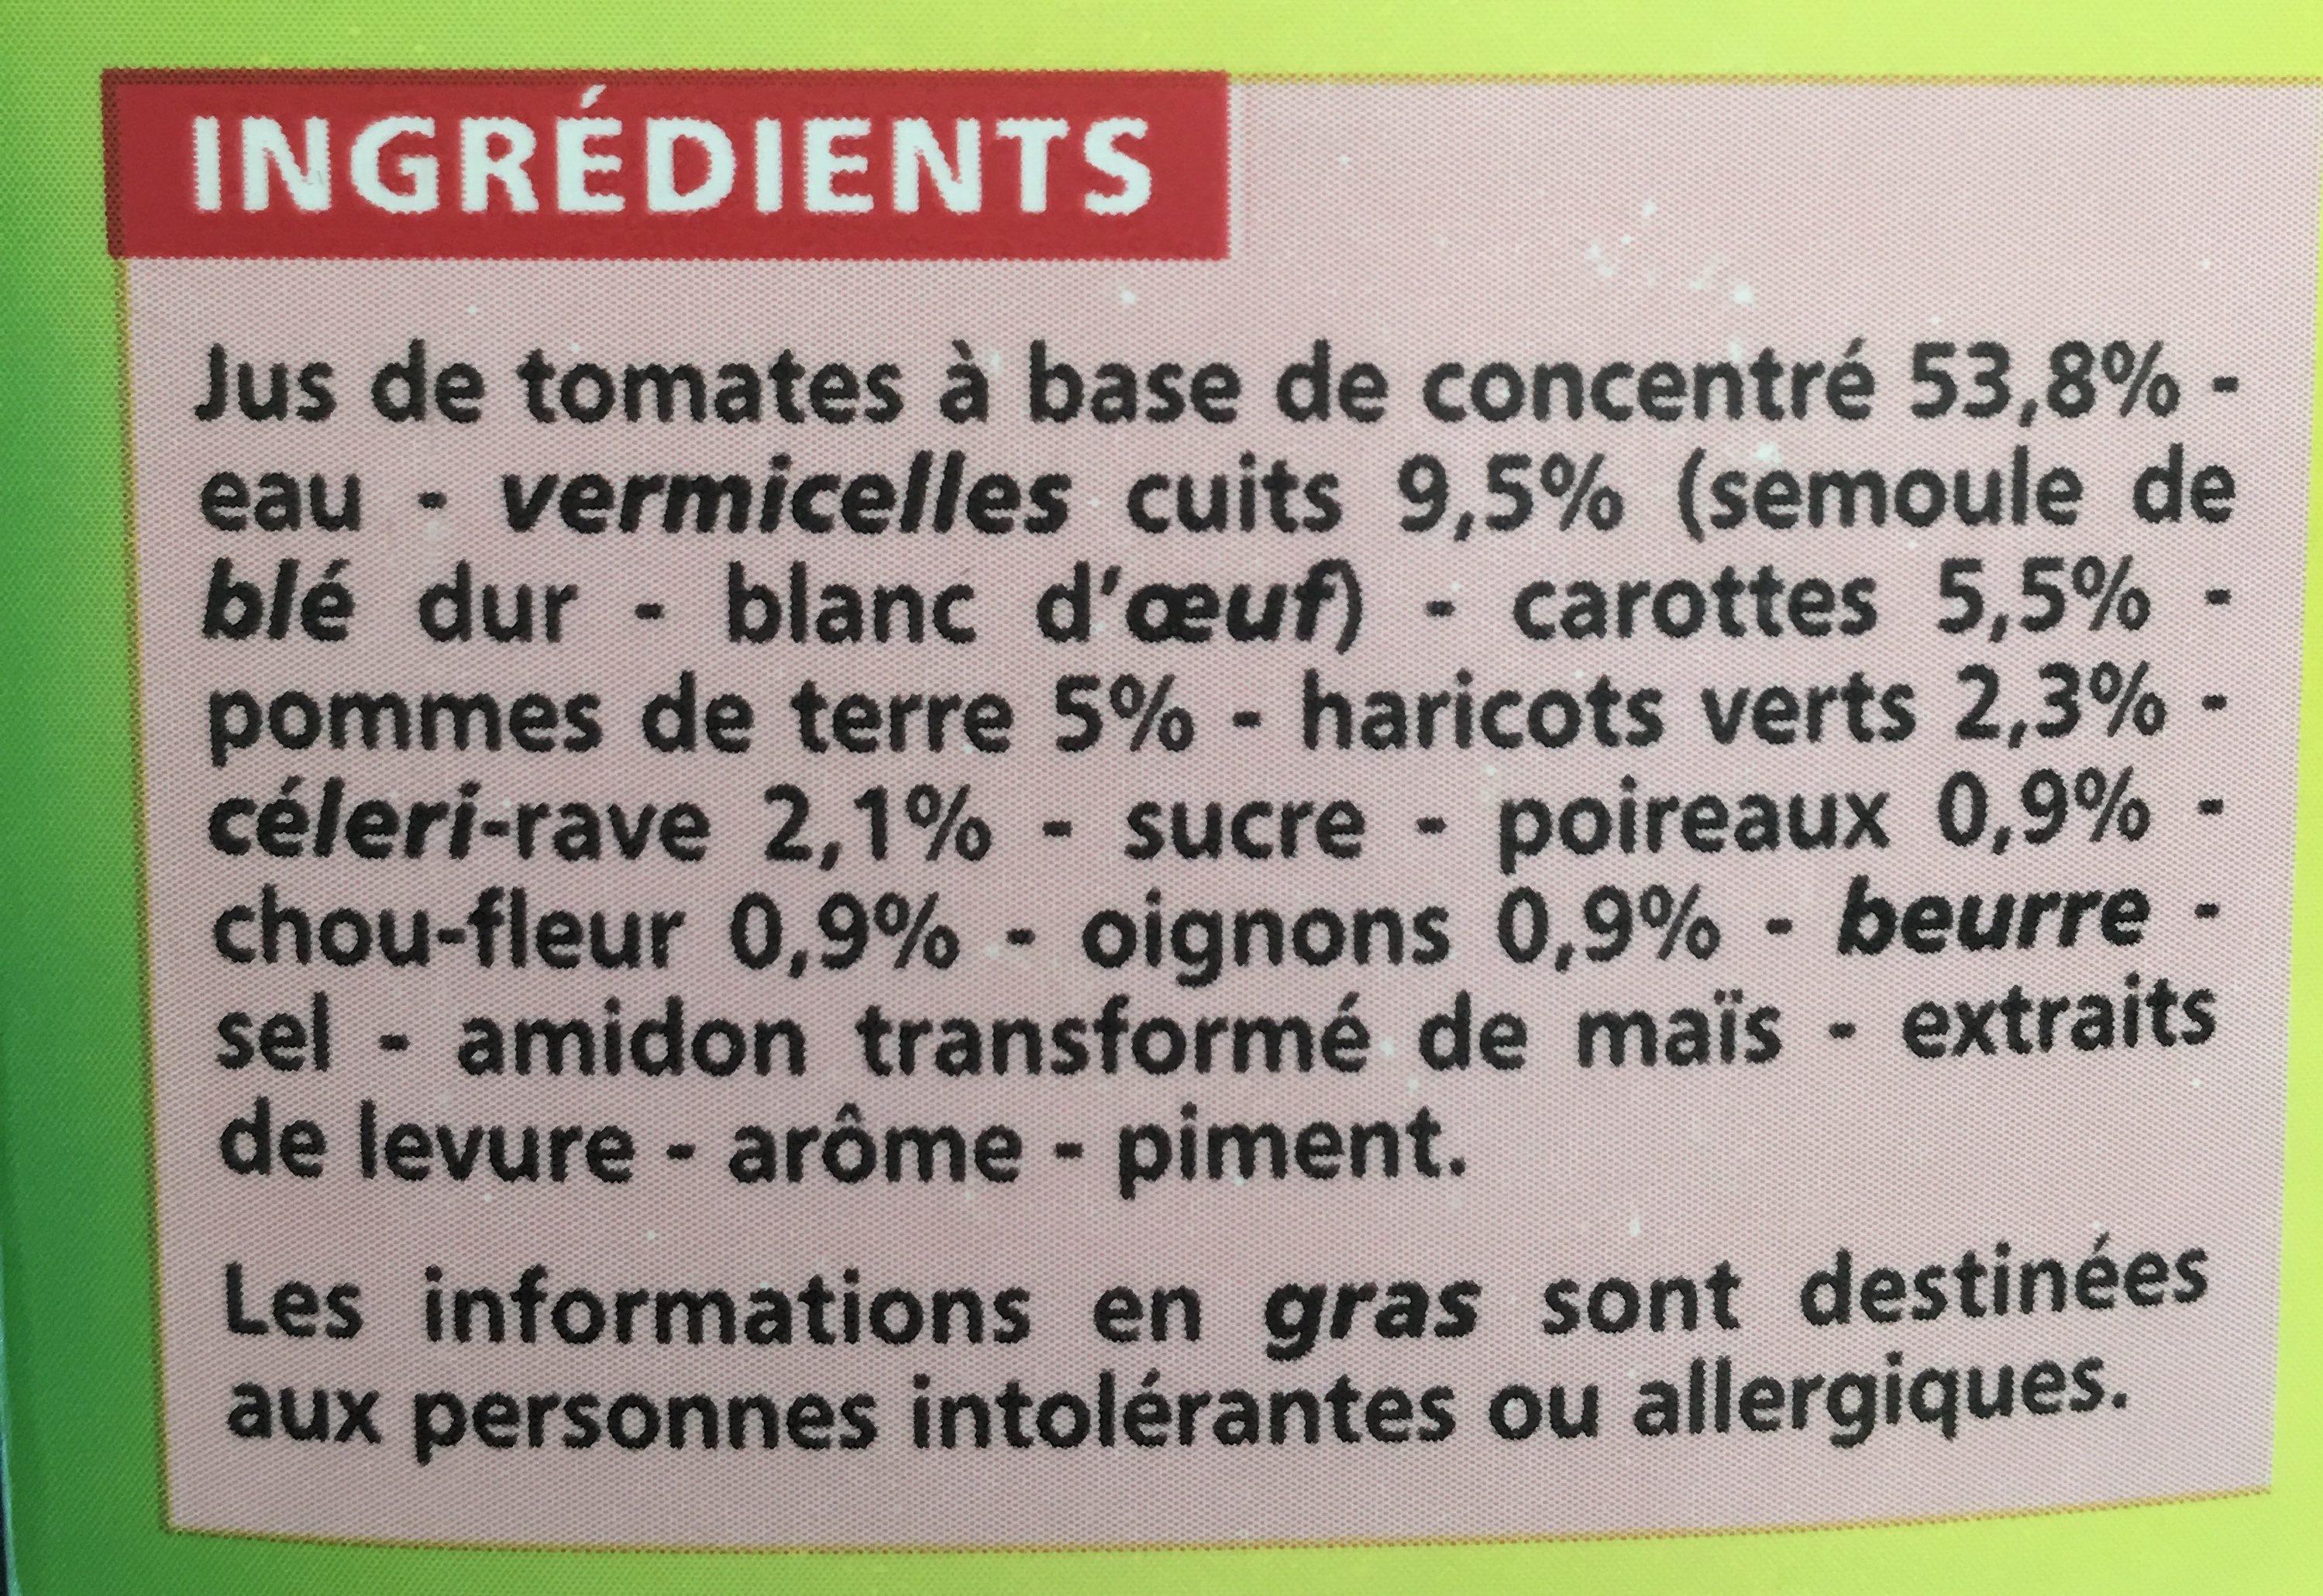 Soupe tomate et vermicelles - Ingredients - fr